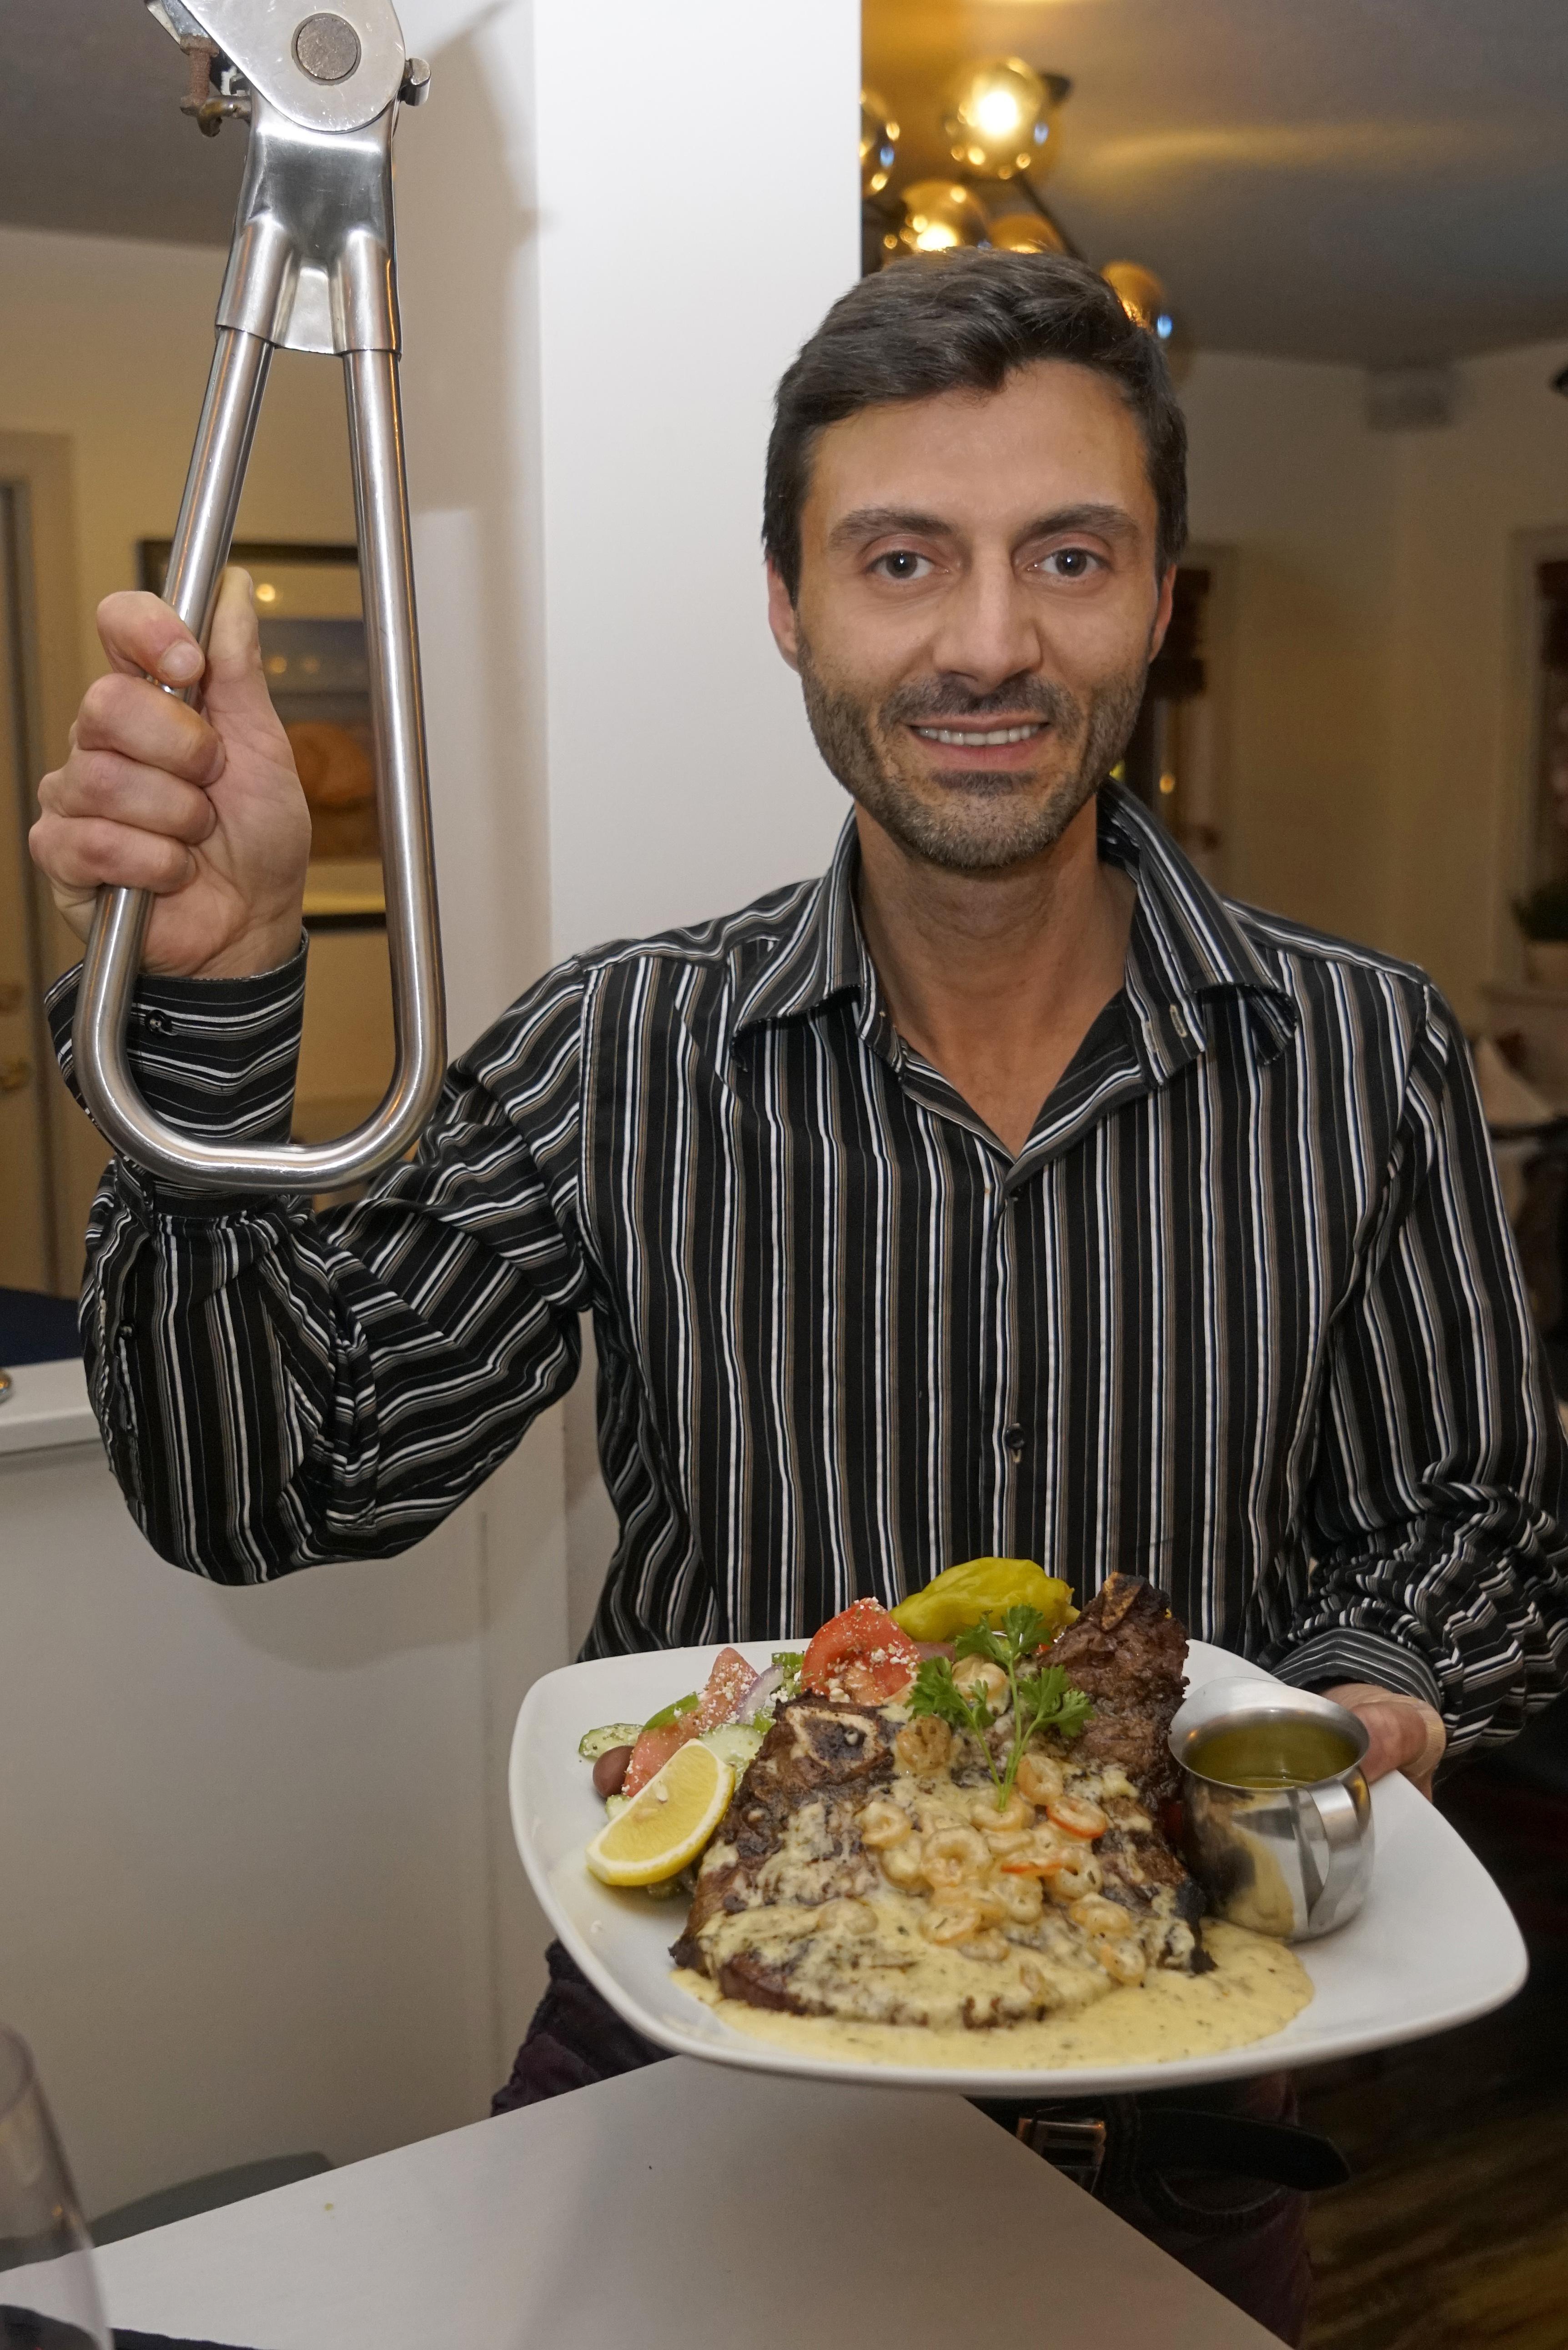 Yianni holding the subway handle and the beautiful 20 Ounces, AAA bone-in ribeye steak